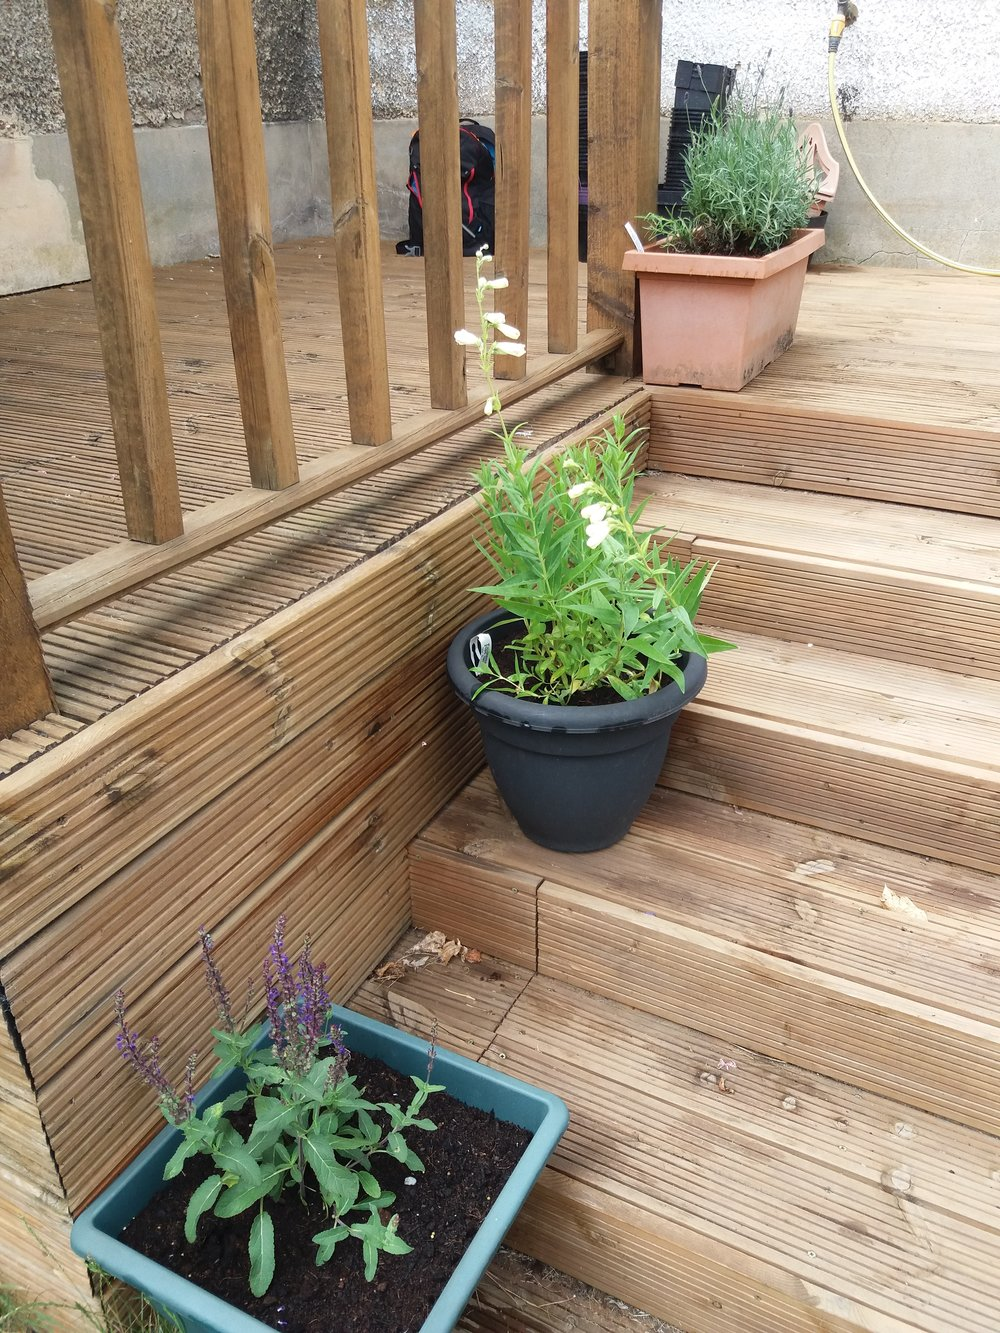 Pots for the cottage garden - Salvia, Penstemon and Lavender